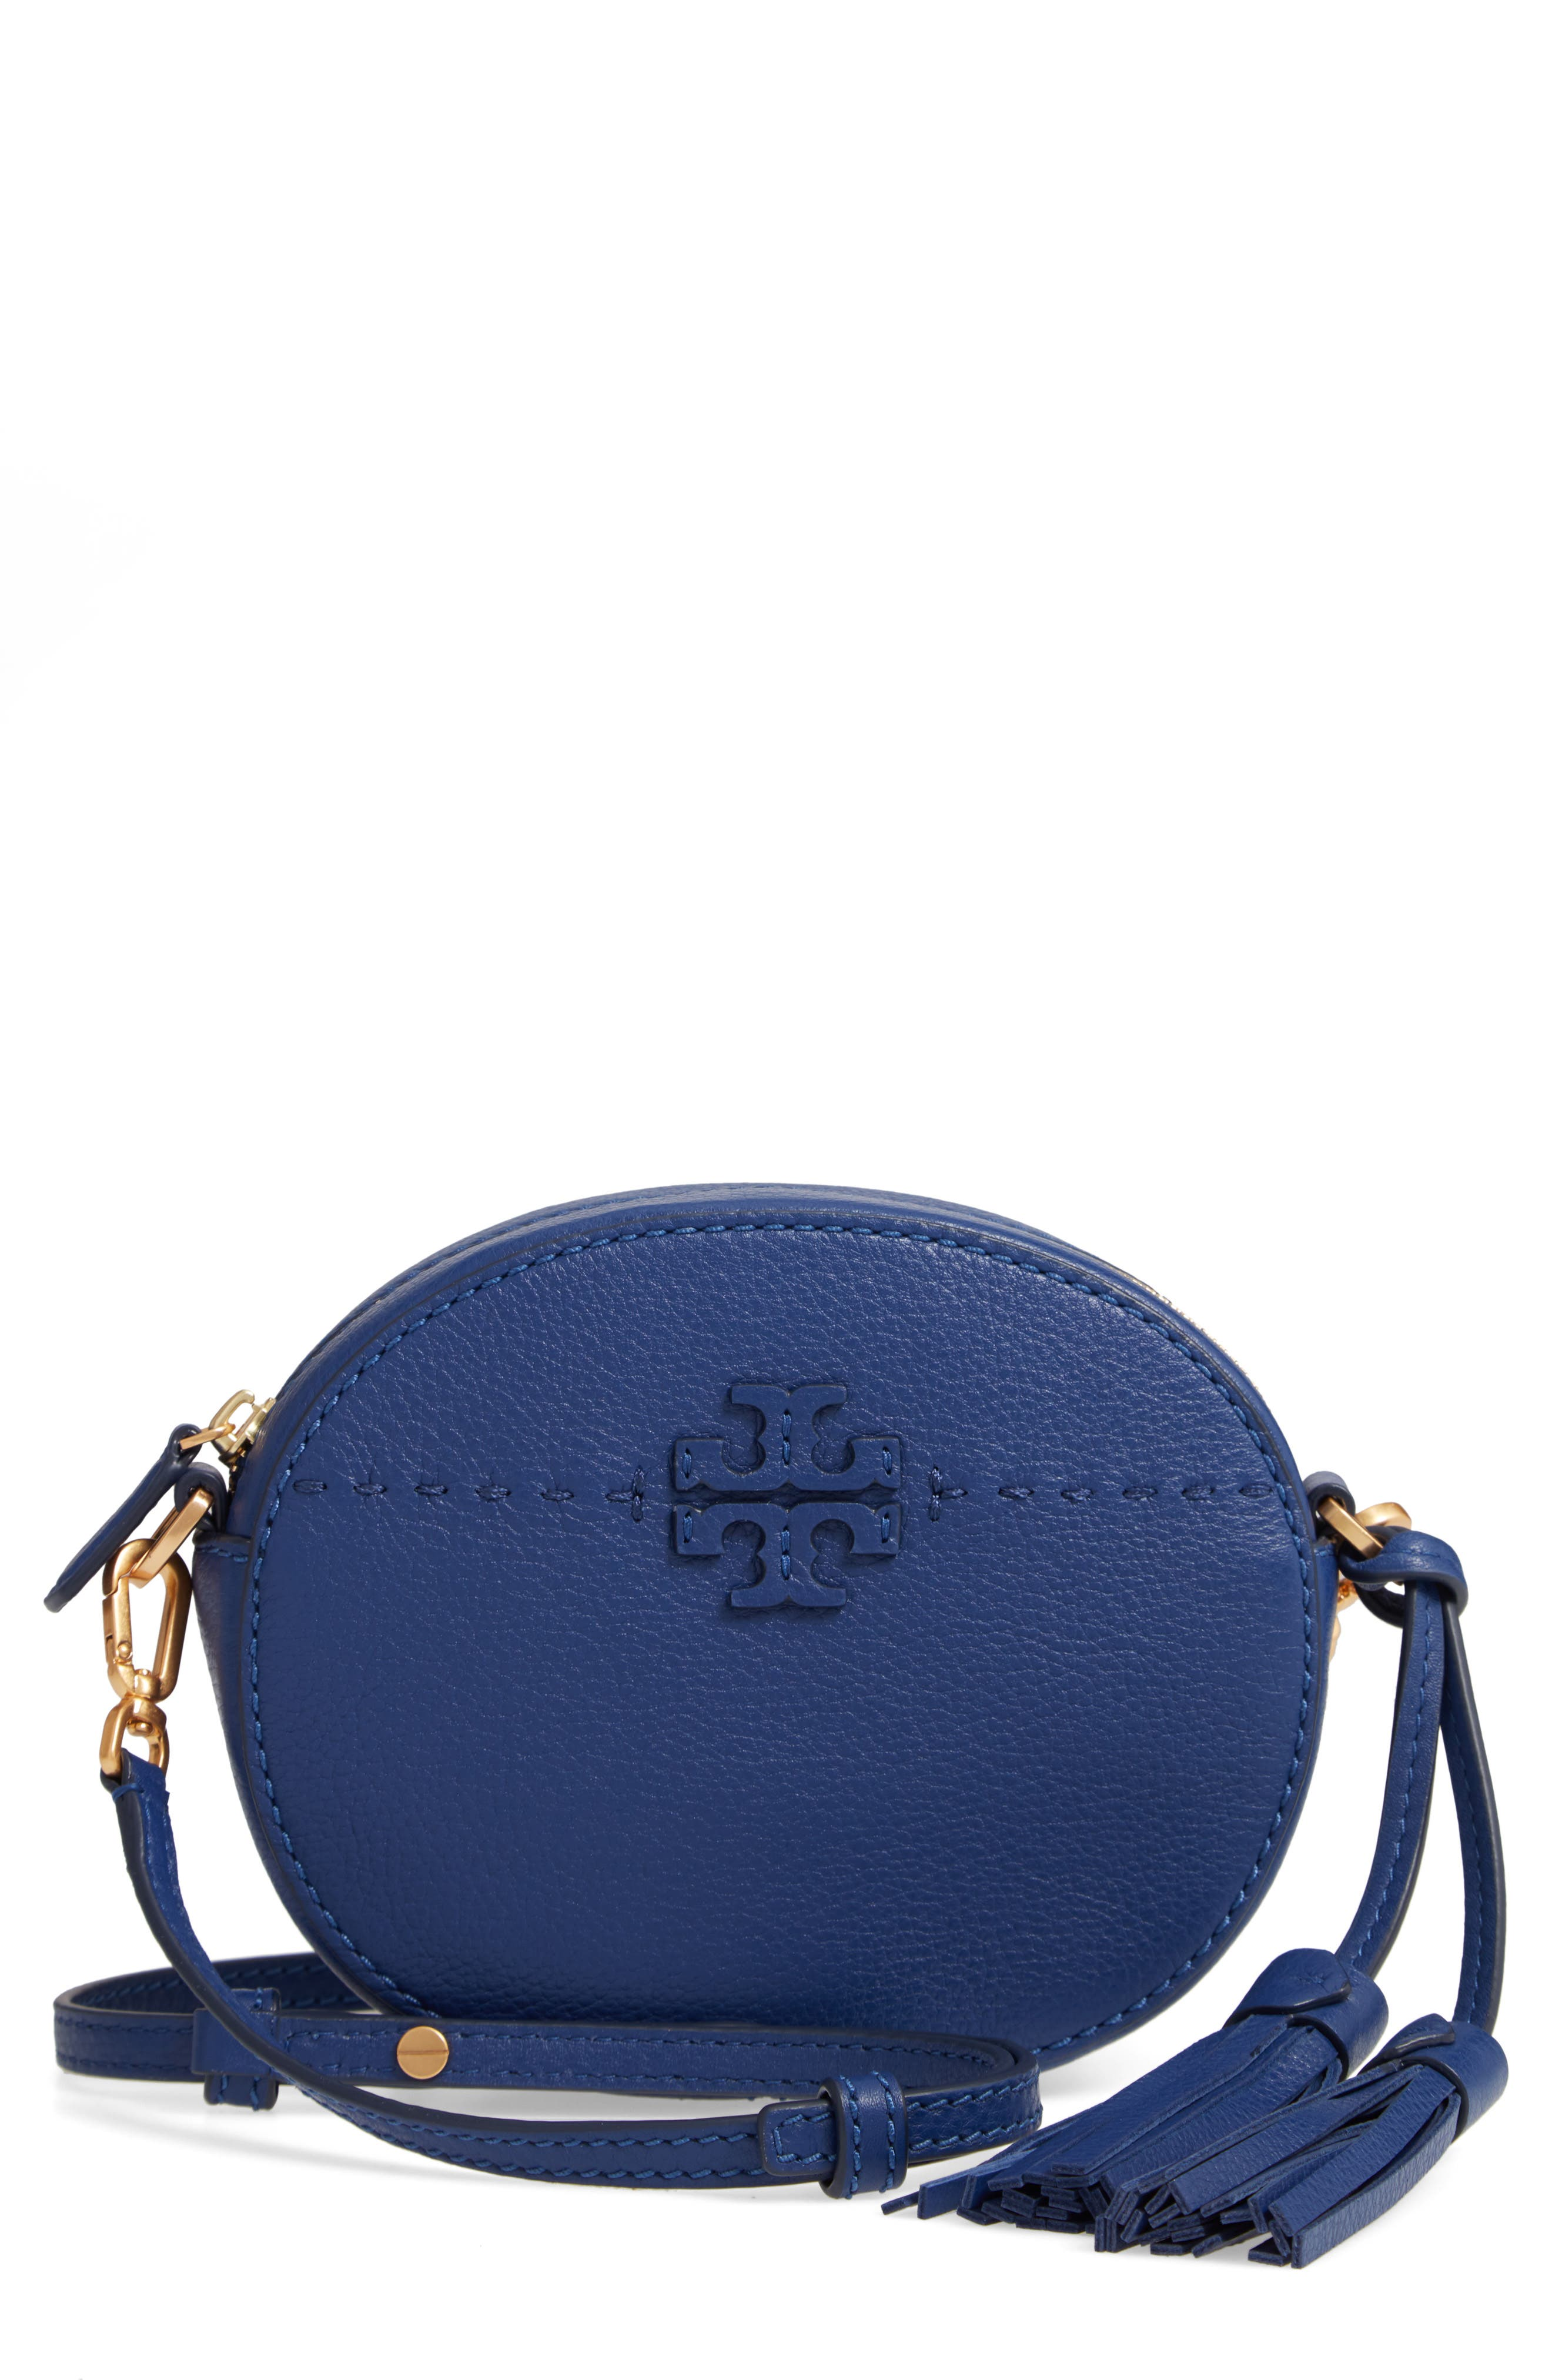 McGraw Leather Crossbody Bag,                             Main thumbnail 1, color,                             BRIGHT INDIGO